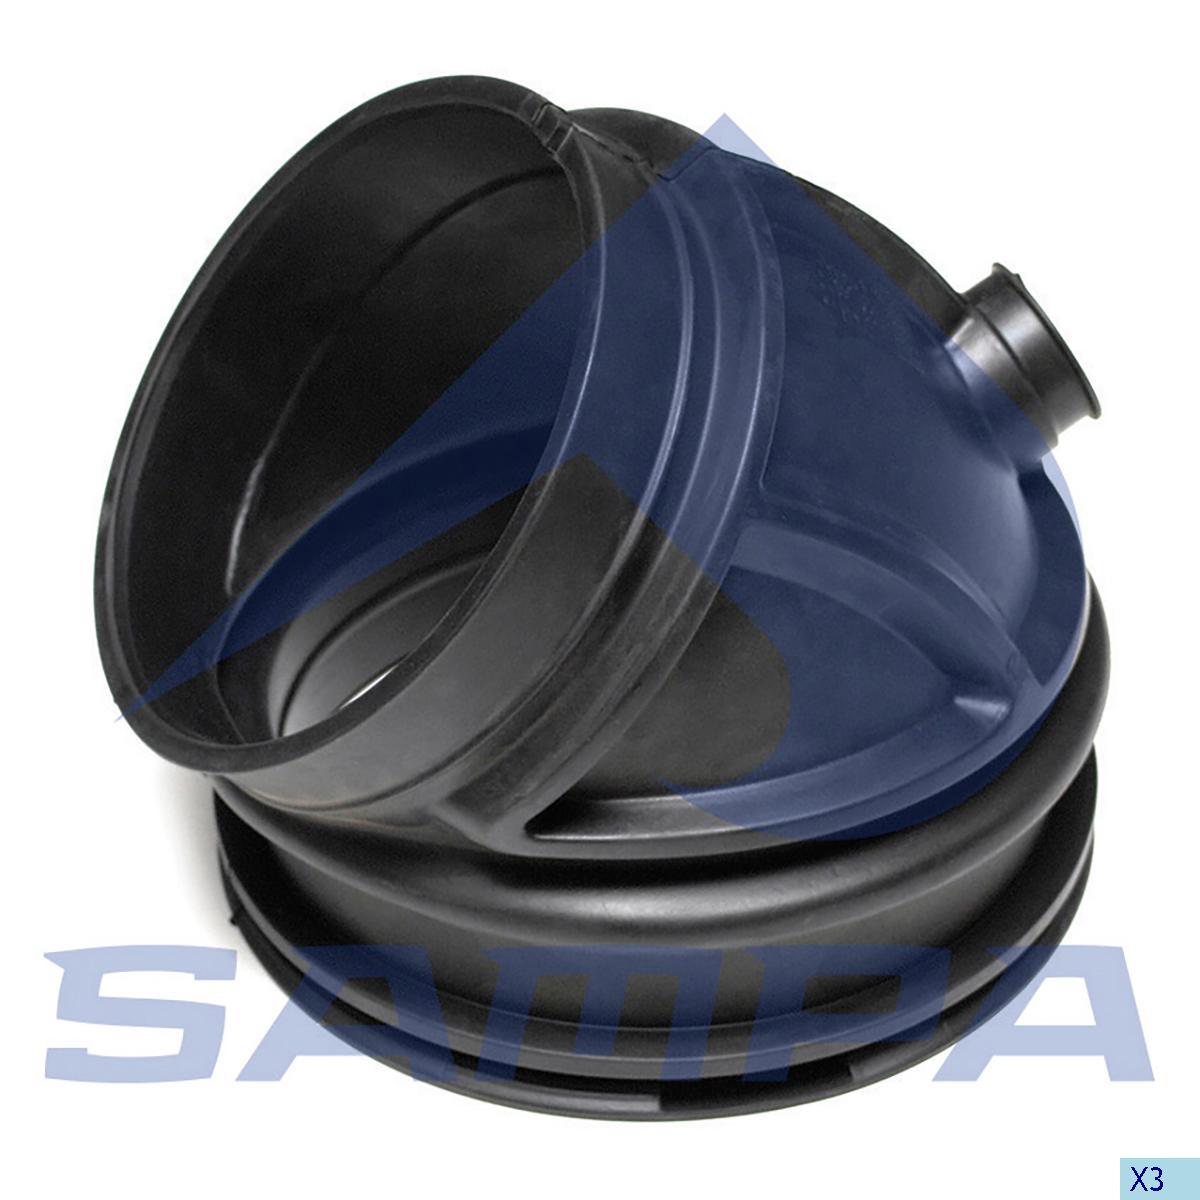 Bellow, Air Filter, Volvo, Engine